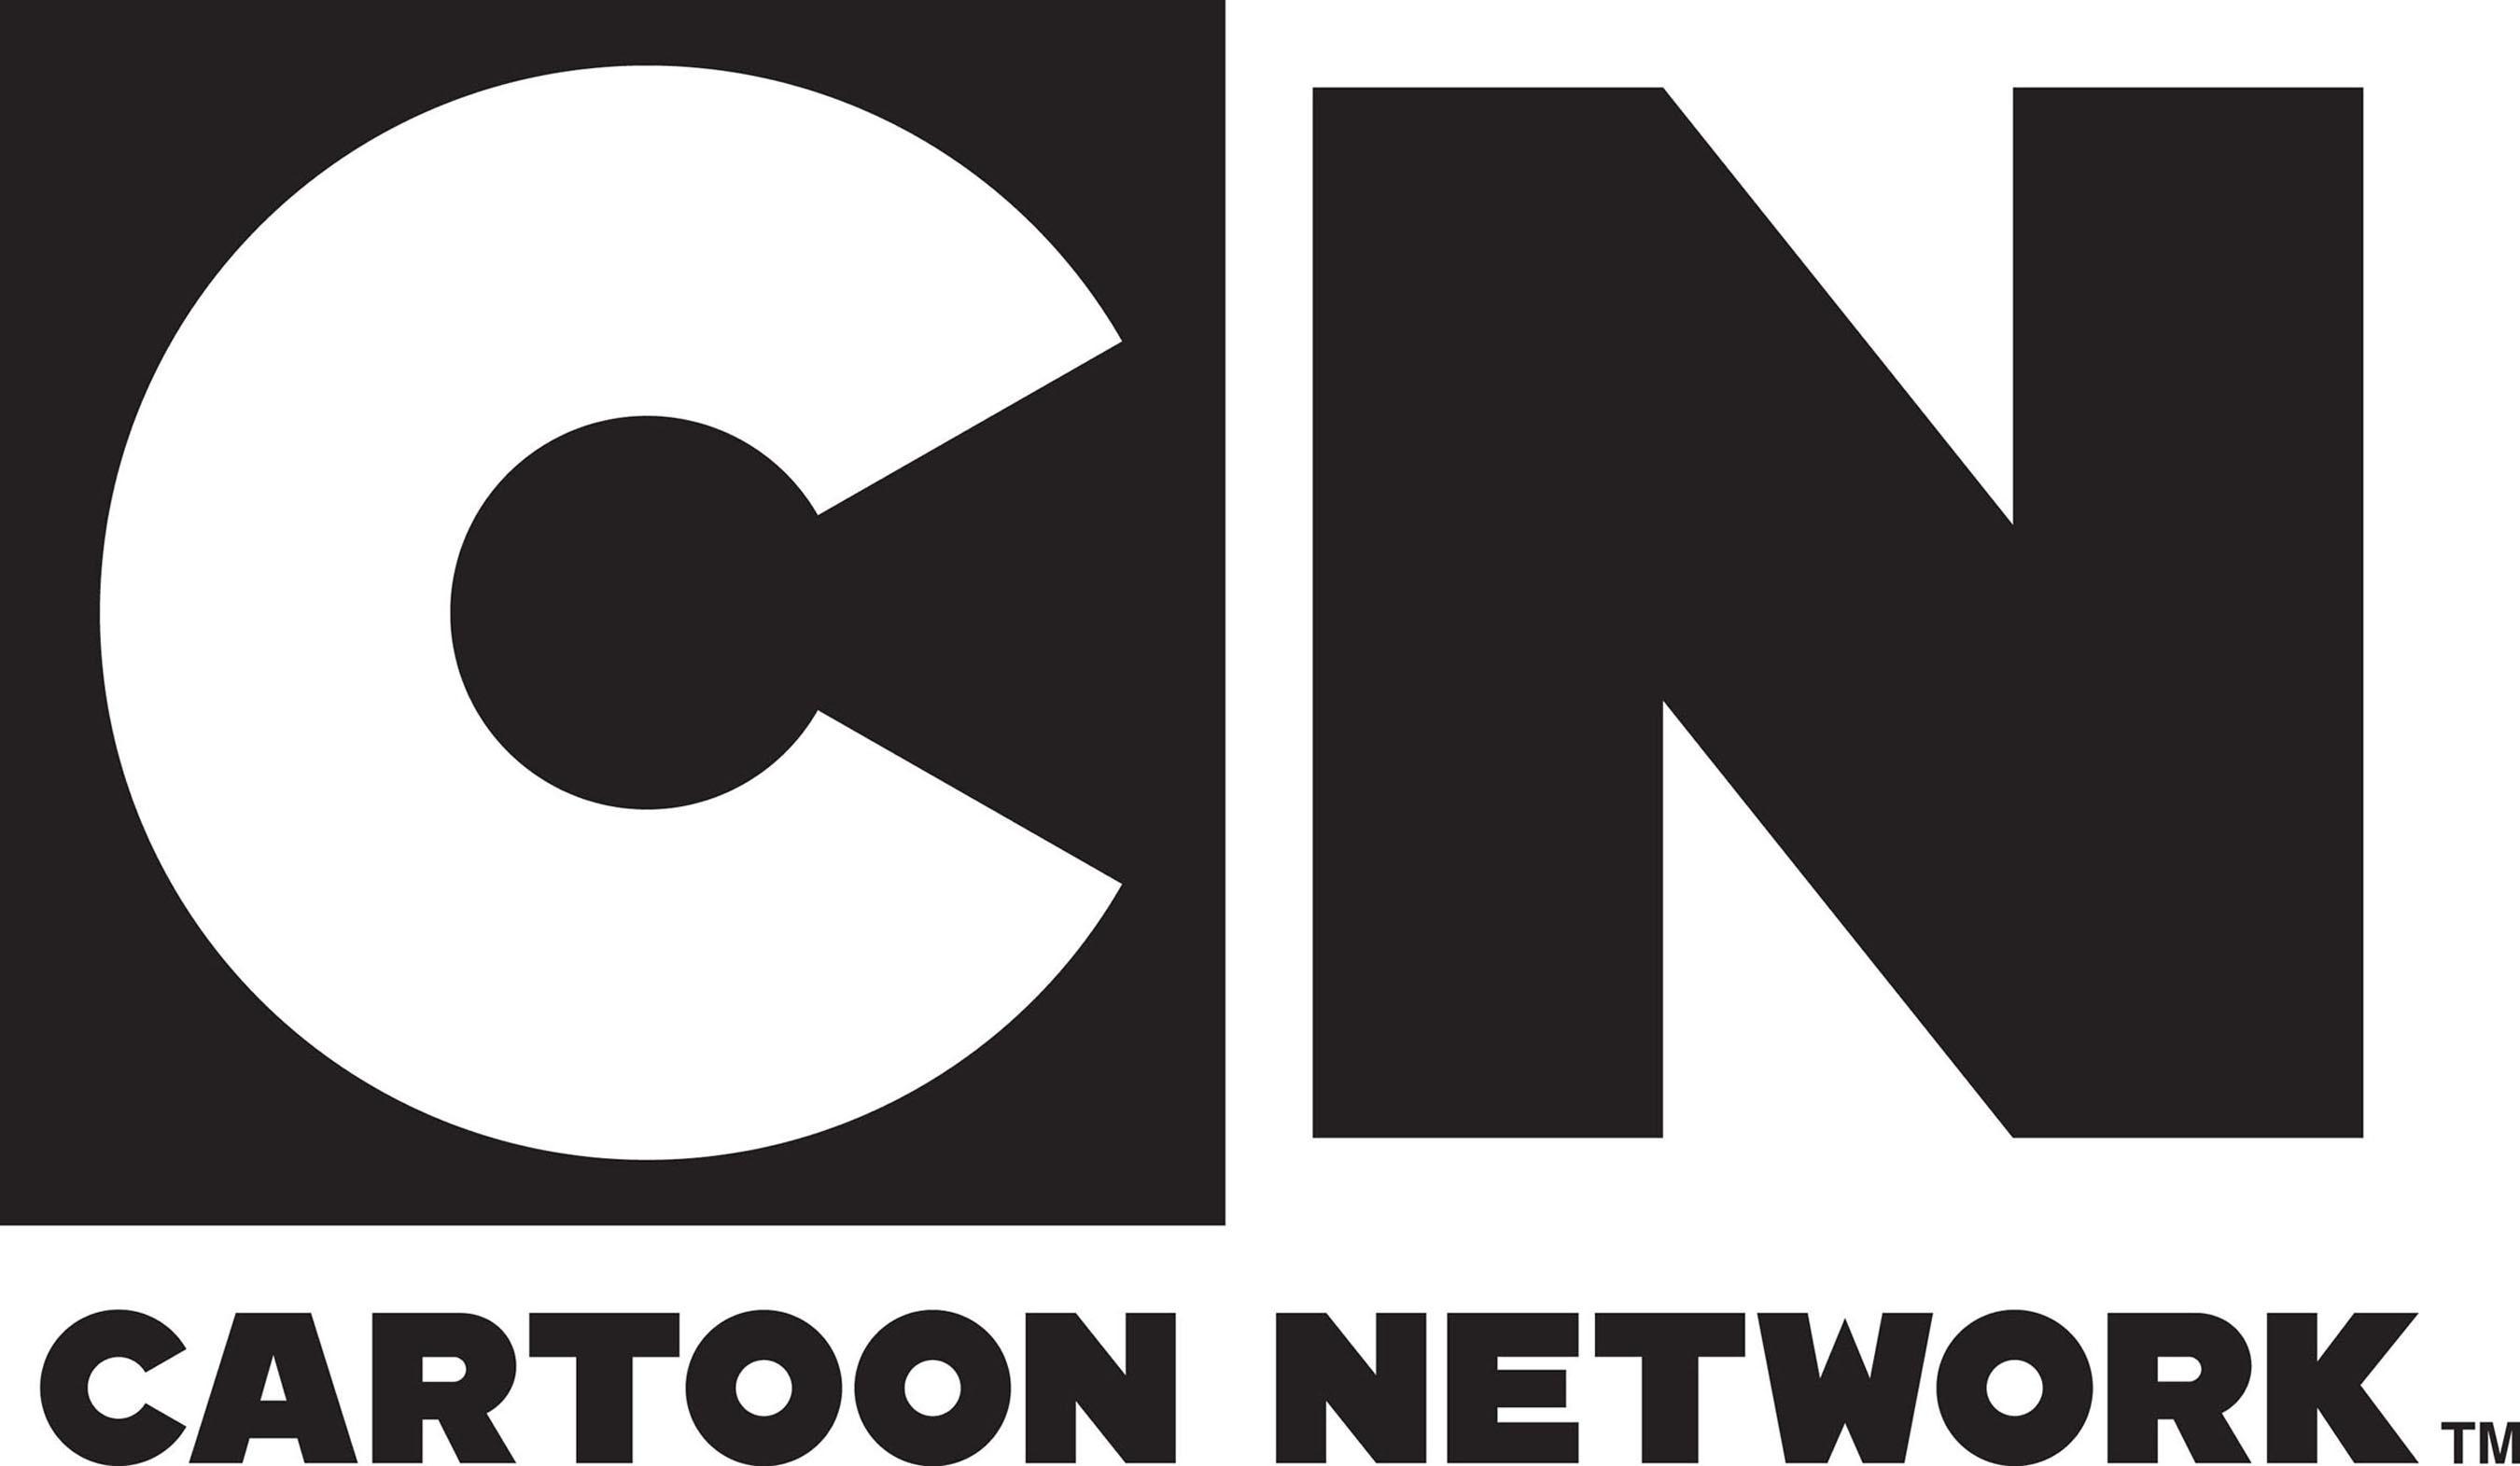 Cartoon Network Logo. (PRNewsFoto/Cartoon Network) (PRNewsFoto/CARTOON NETWORK)